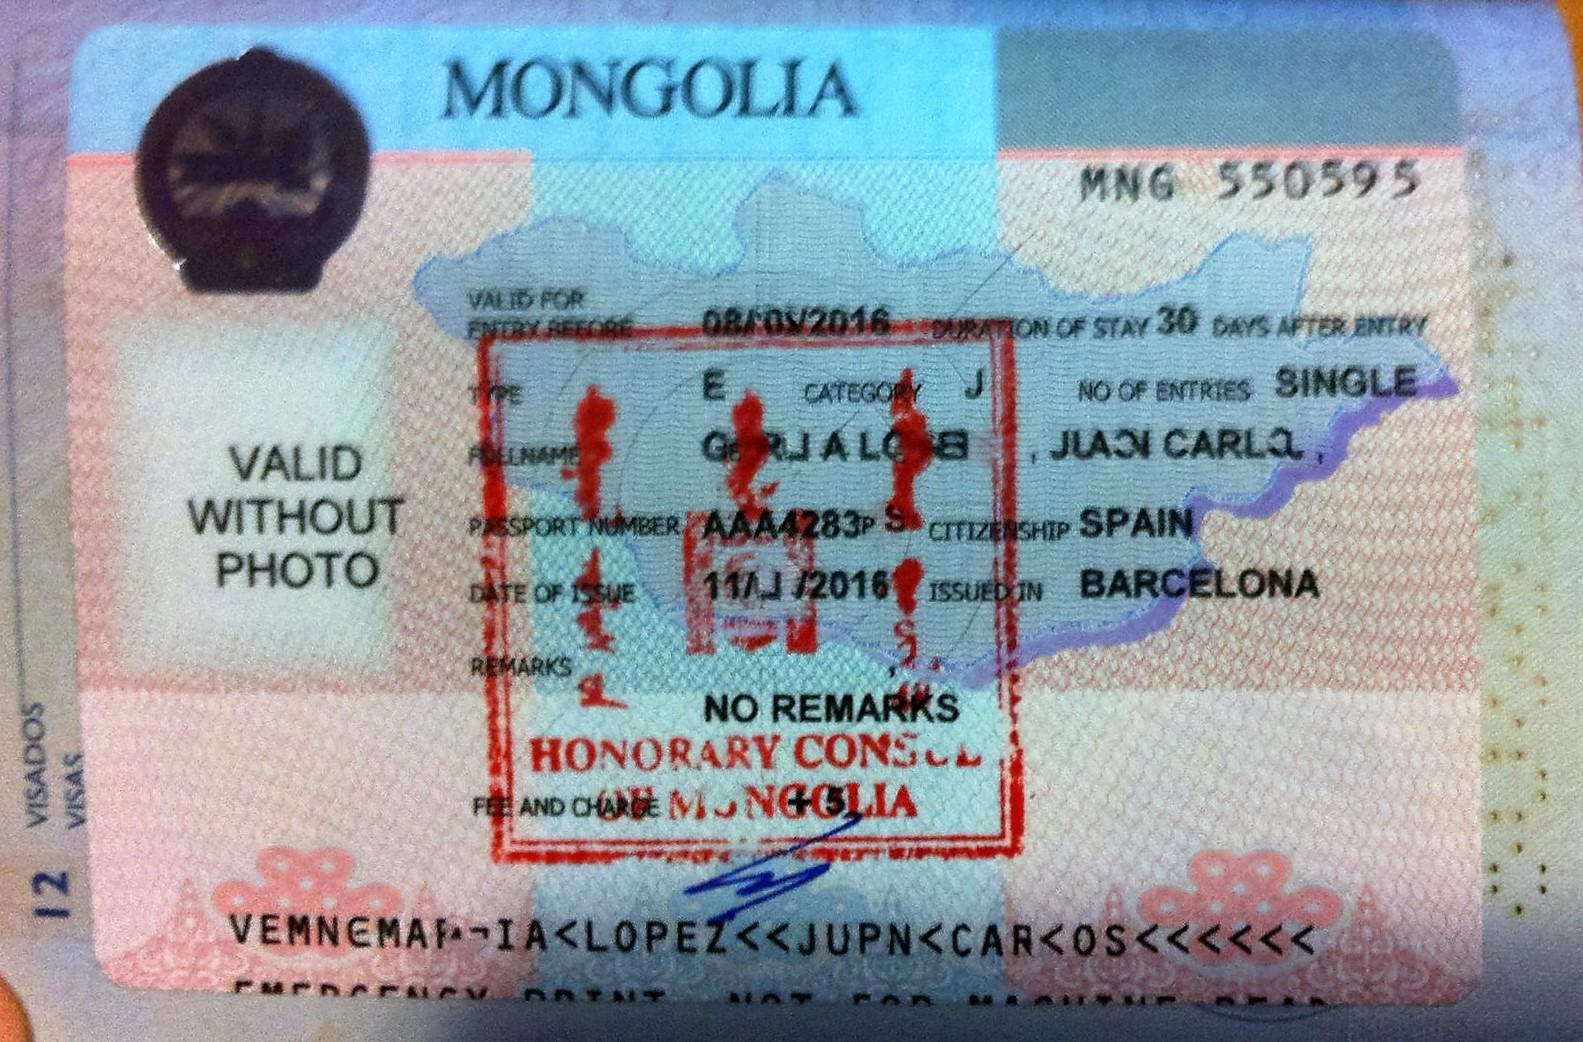 19 De Mayo. Visado De Mongolia